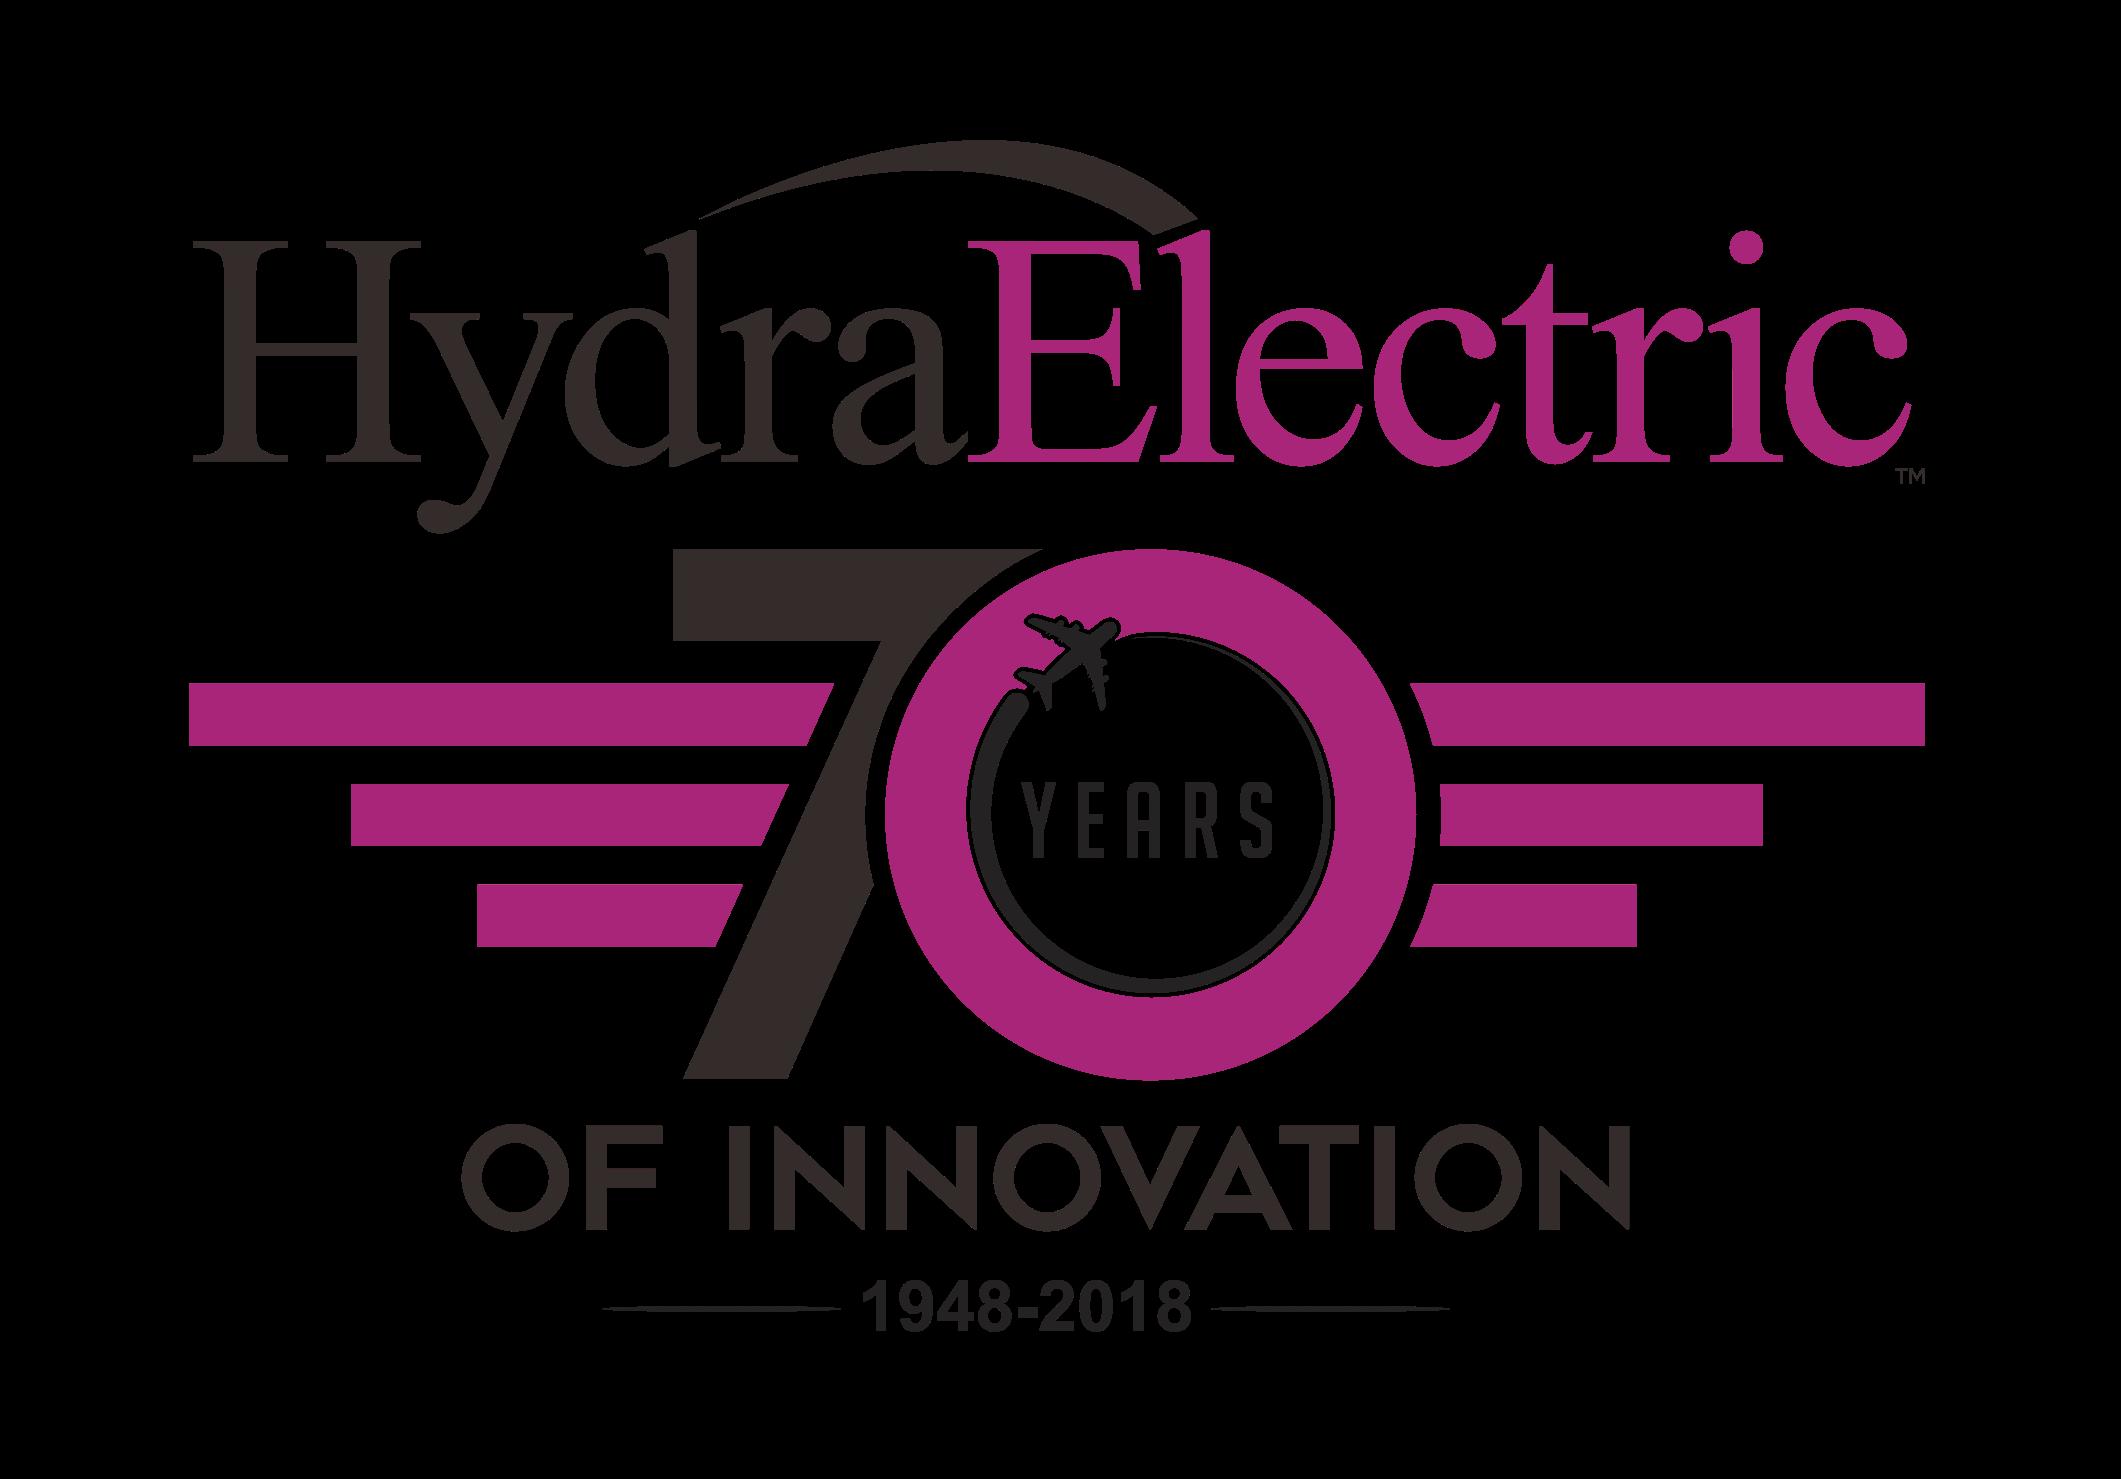 Launching Hydra-Electric's 70th Anniversary at Farnborough International Airshow